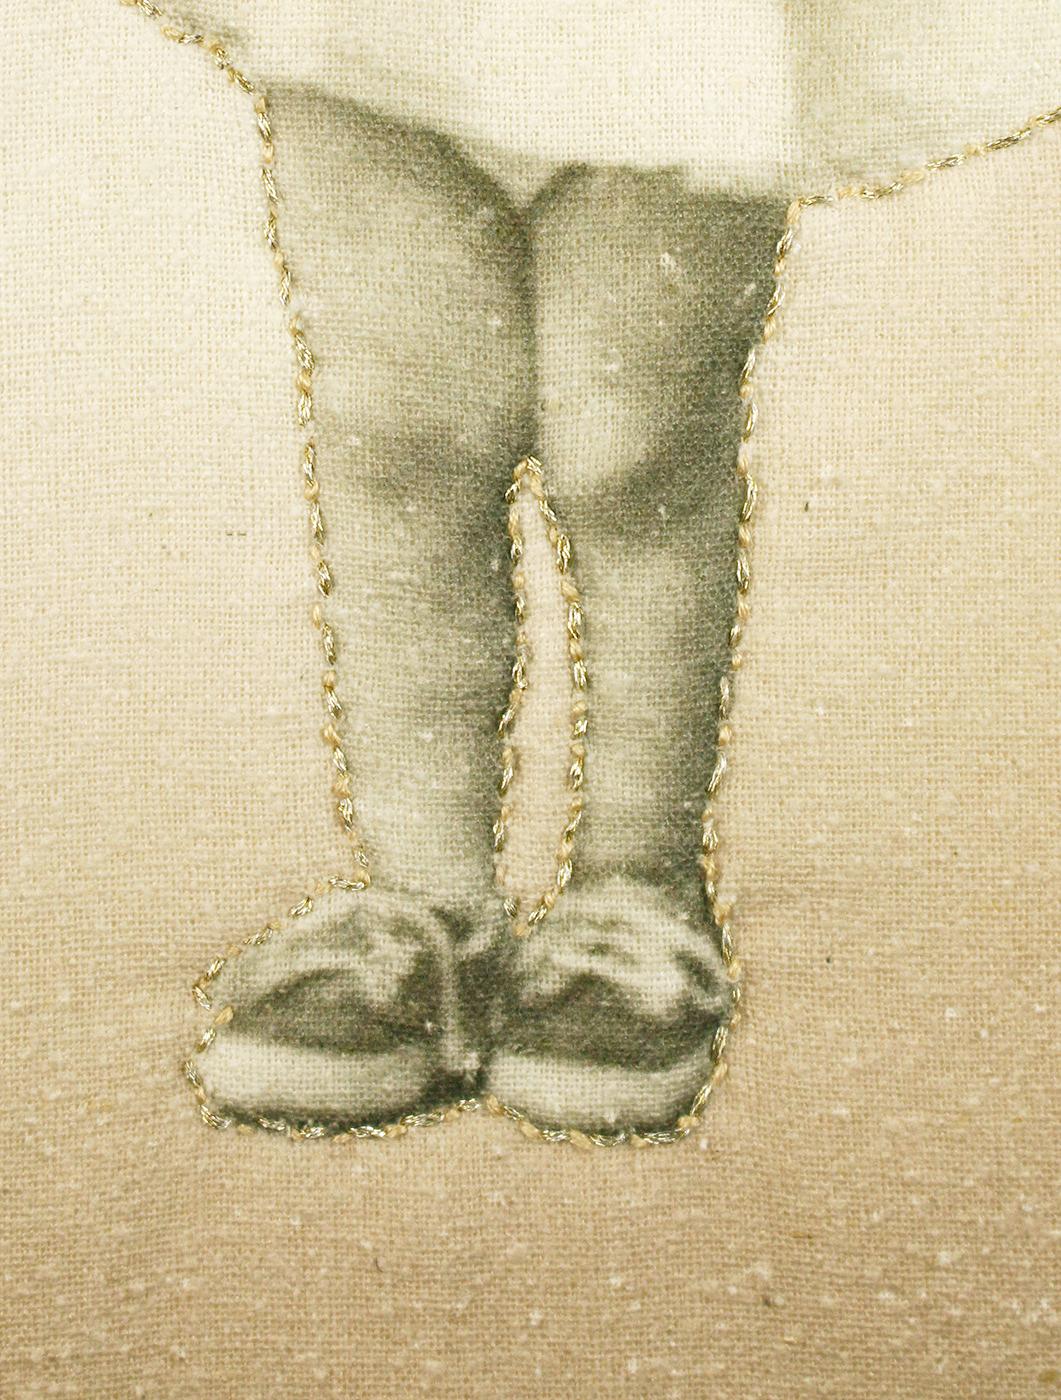 Shelley-Smith-What-The-Dream-Said-2-detail-1.jpg